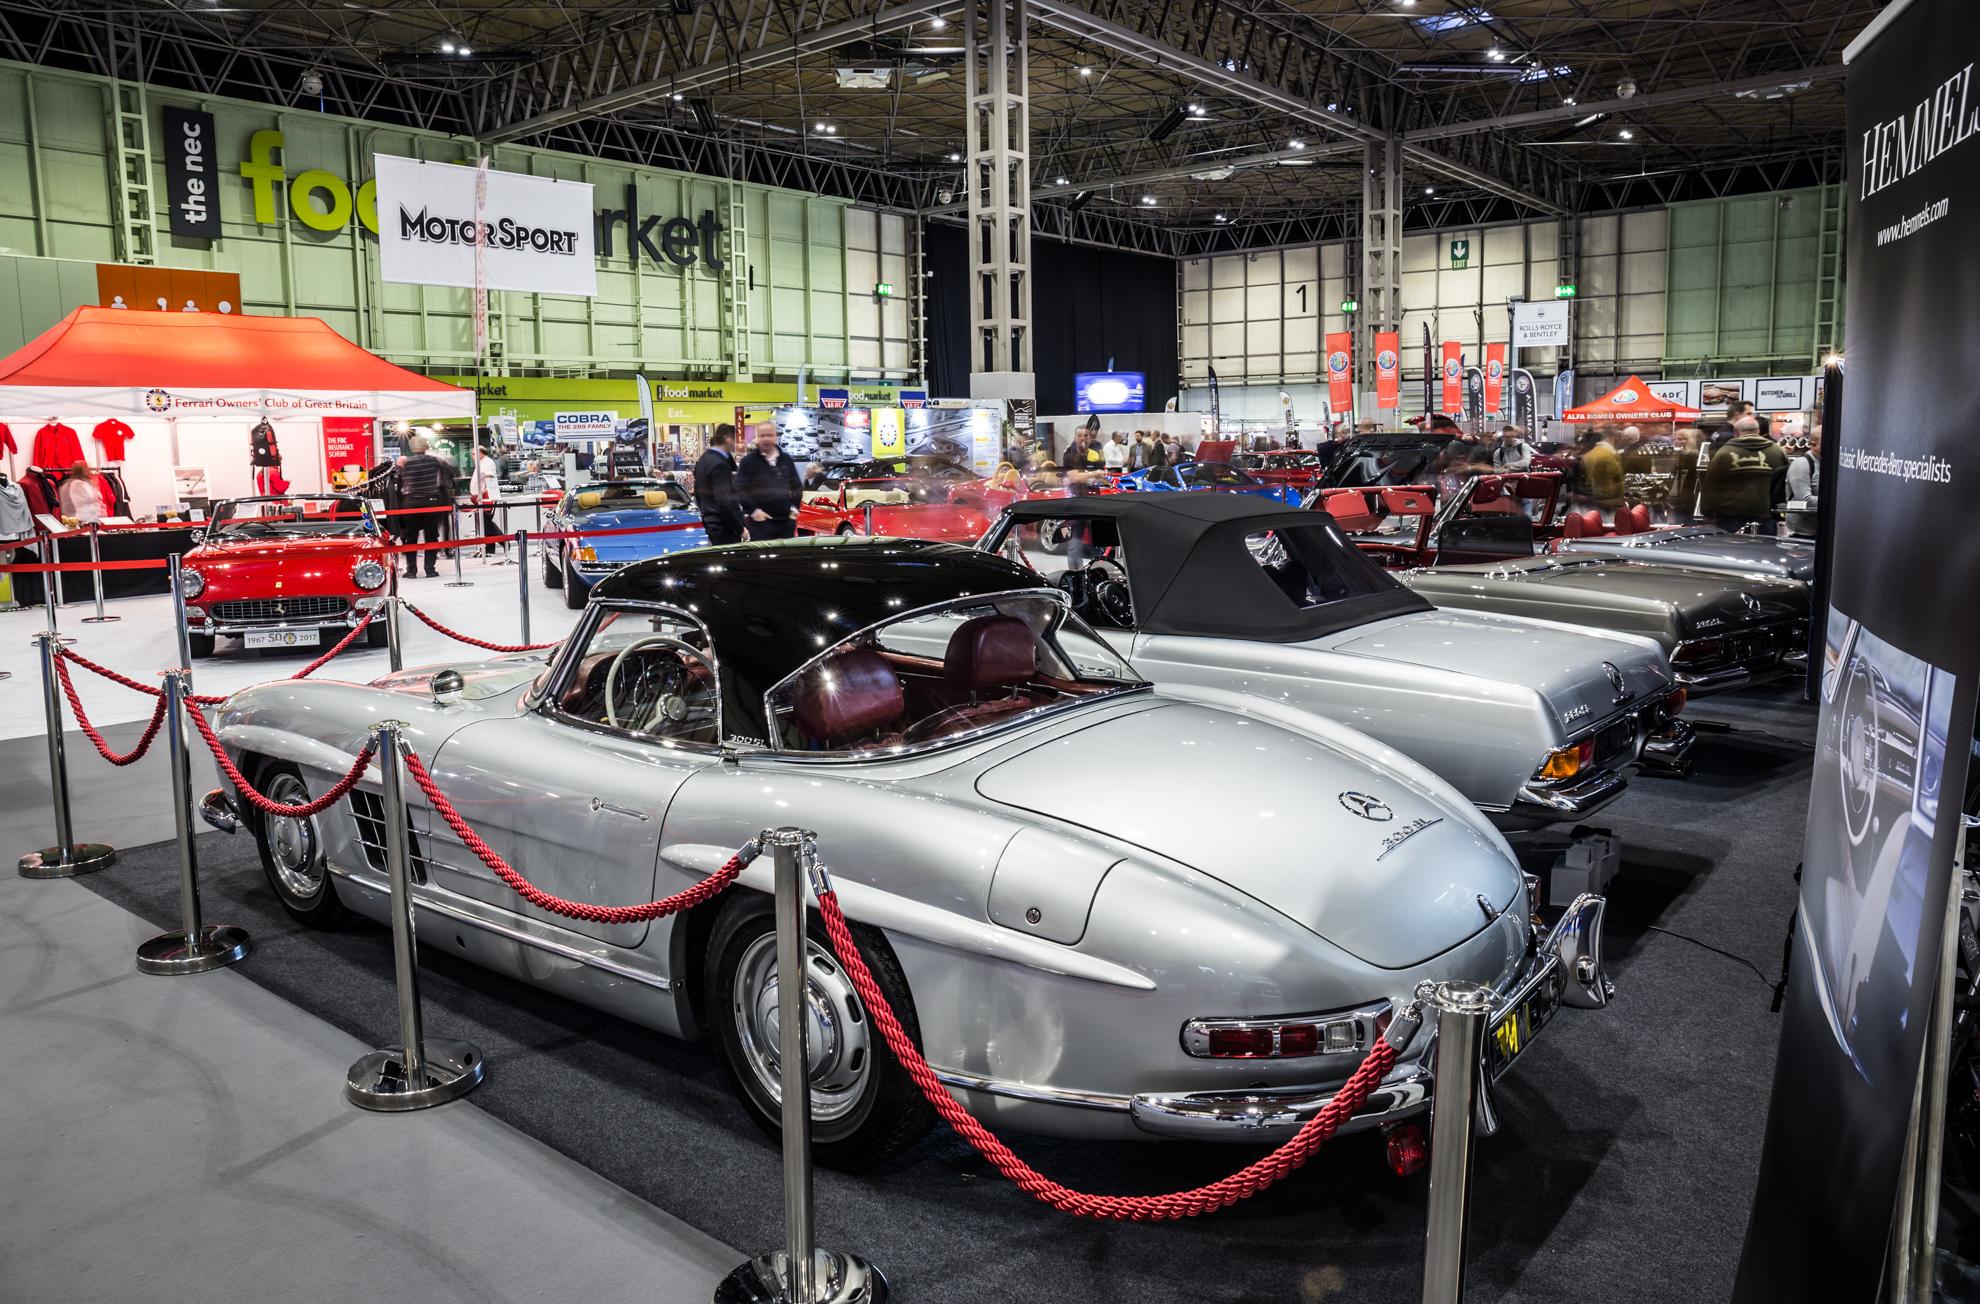 hemmels 300SL restoration